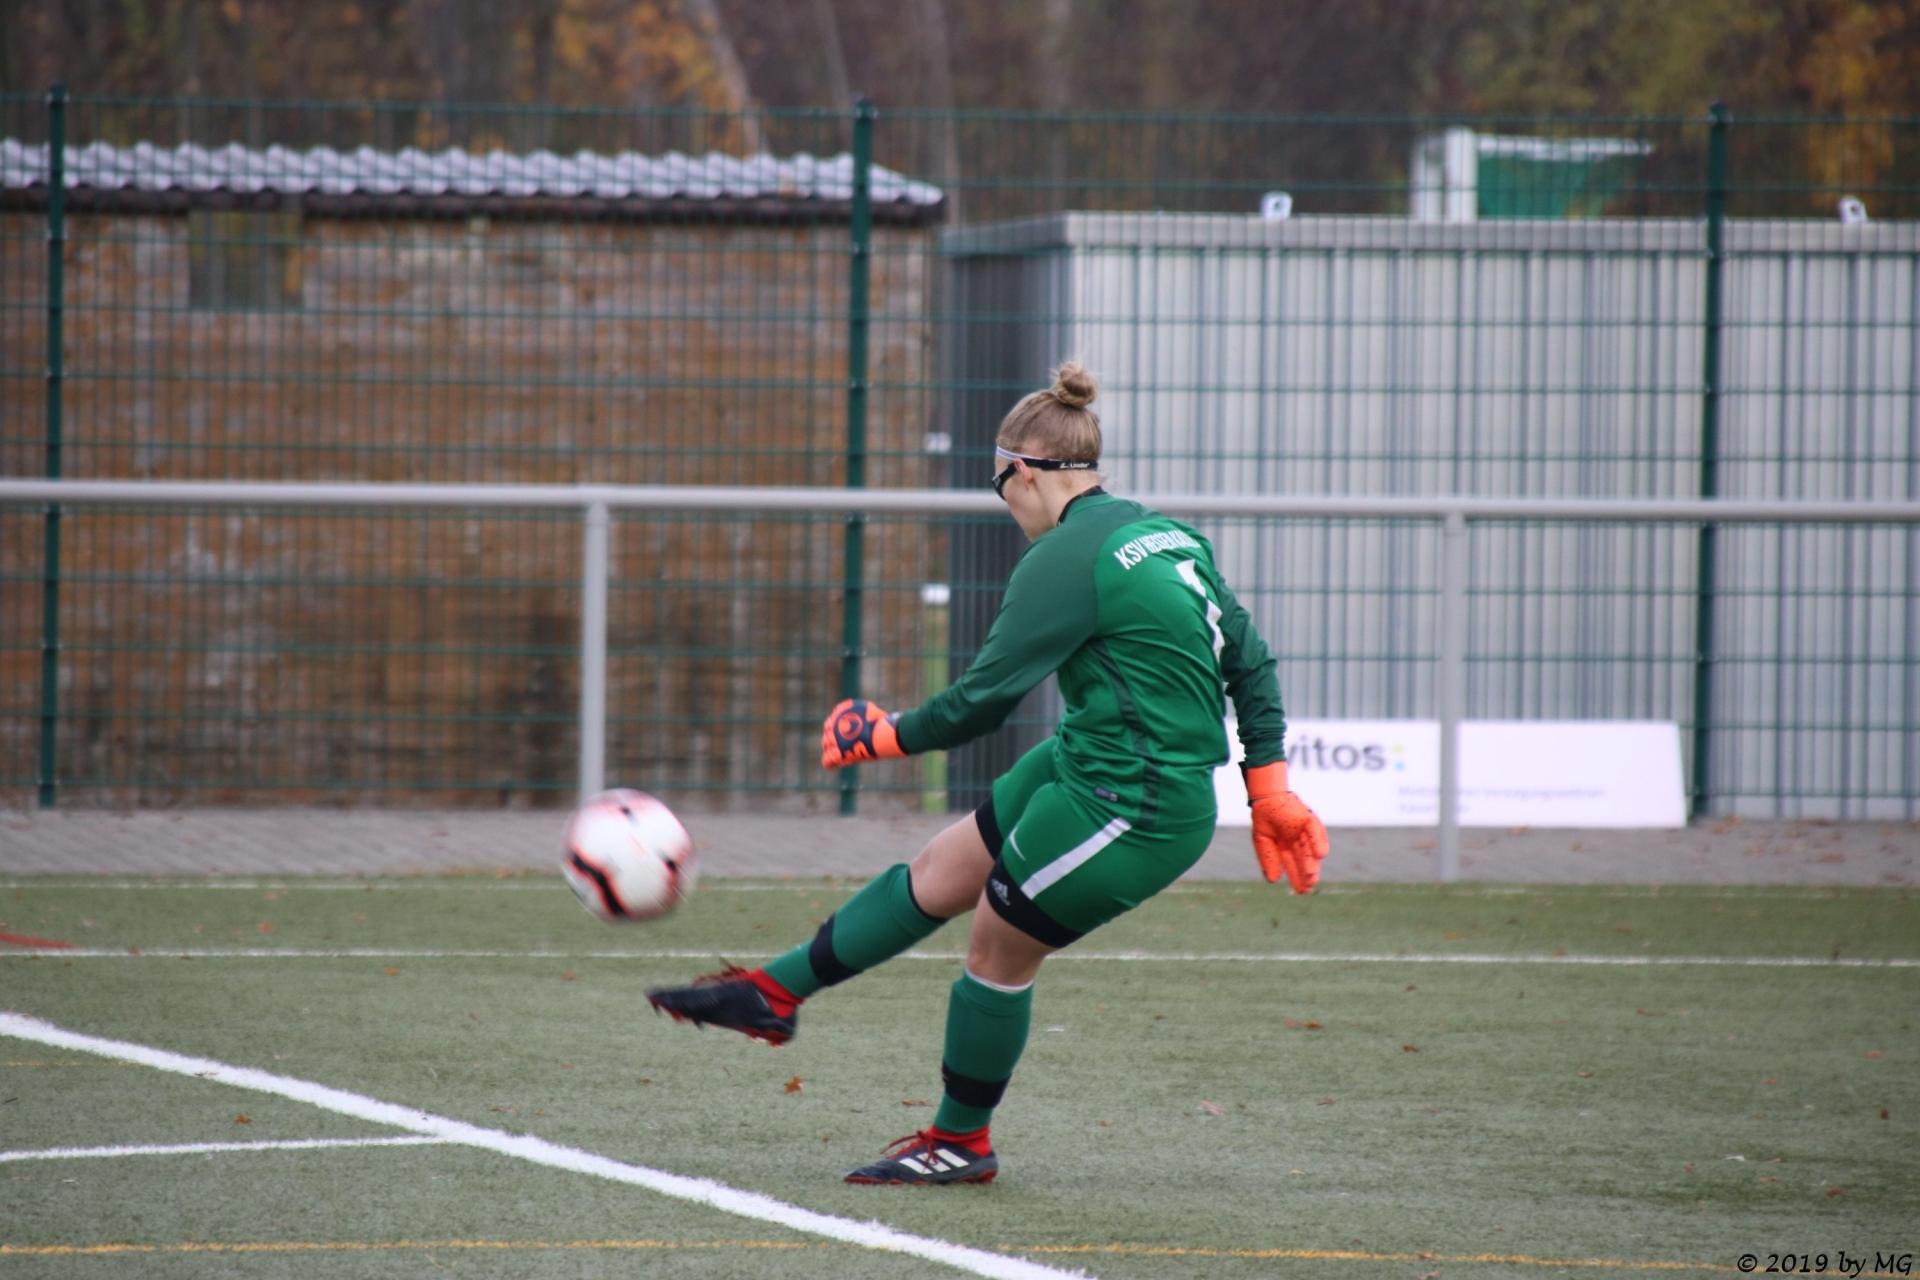 KSV Hessen Kassel - MFFC Wiesbaden